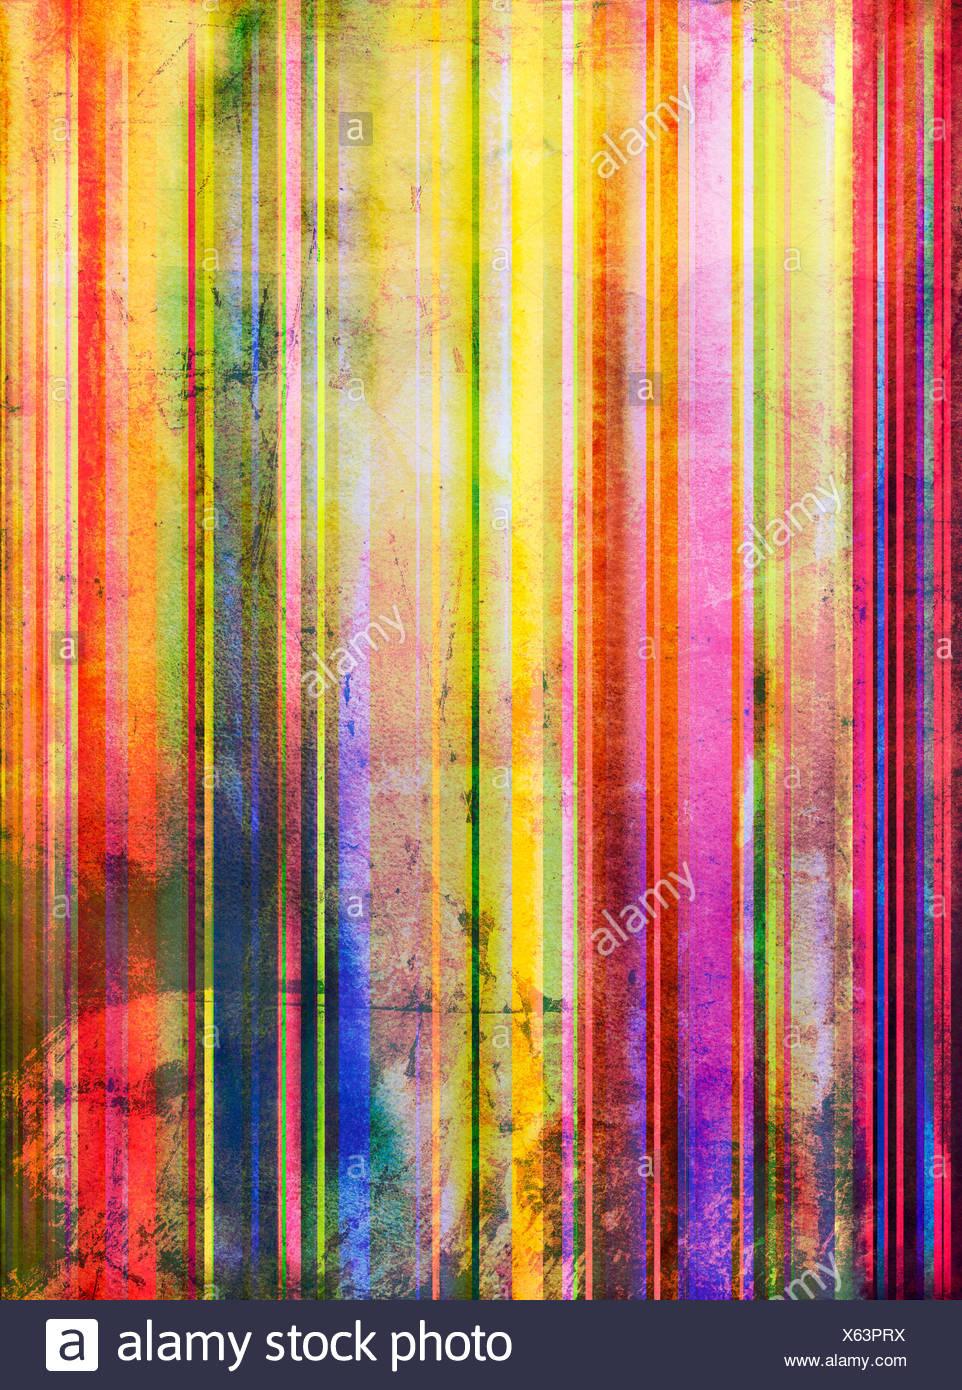 aquarell abstrakt muster alt streifen - Stock Image